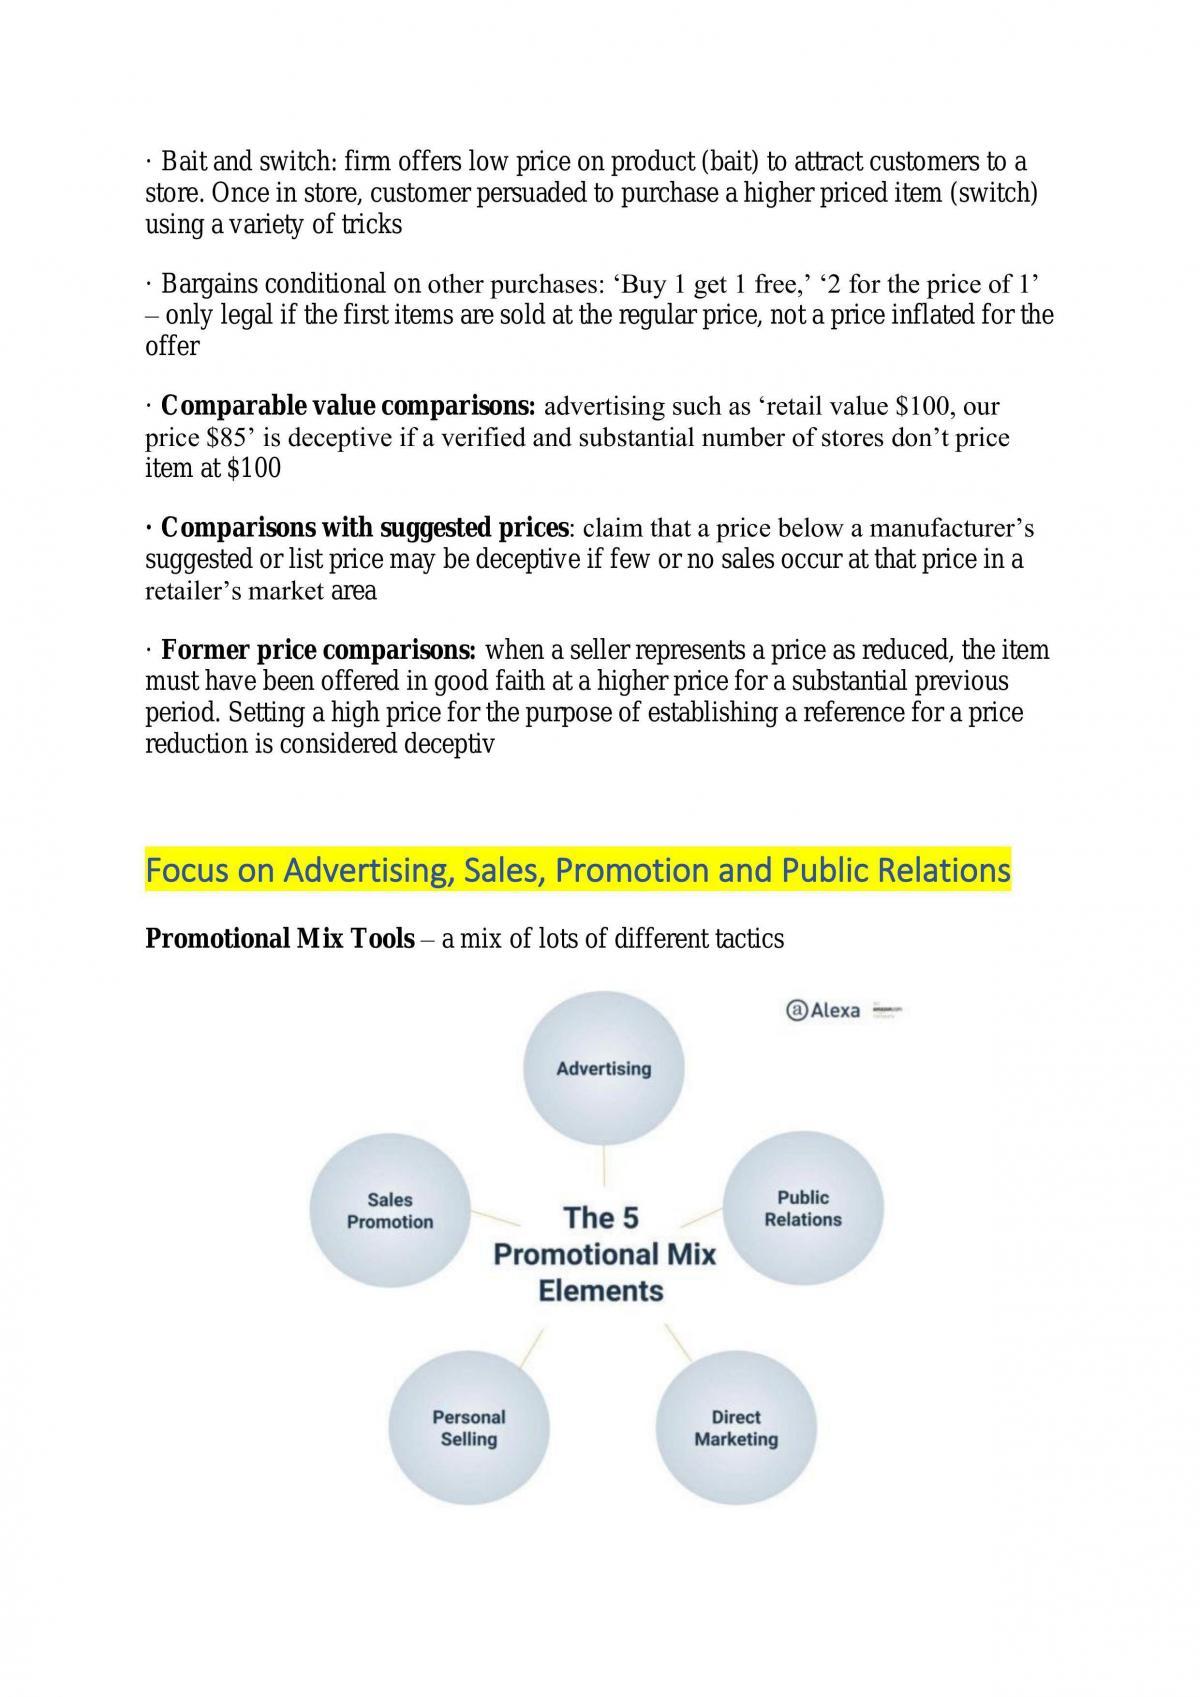 MART112 Marketing Management - Page 21